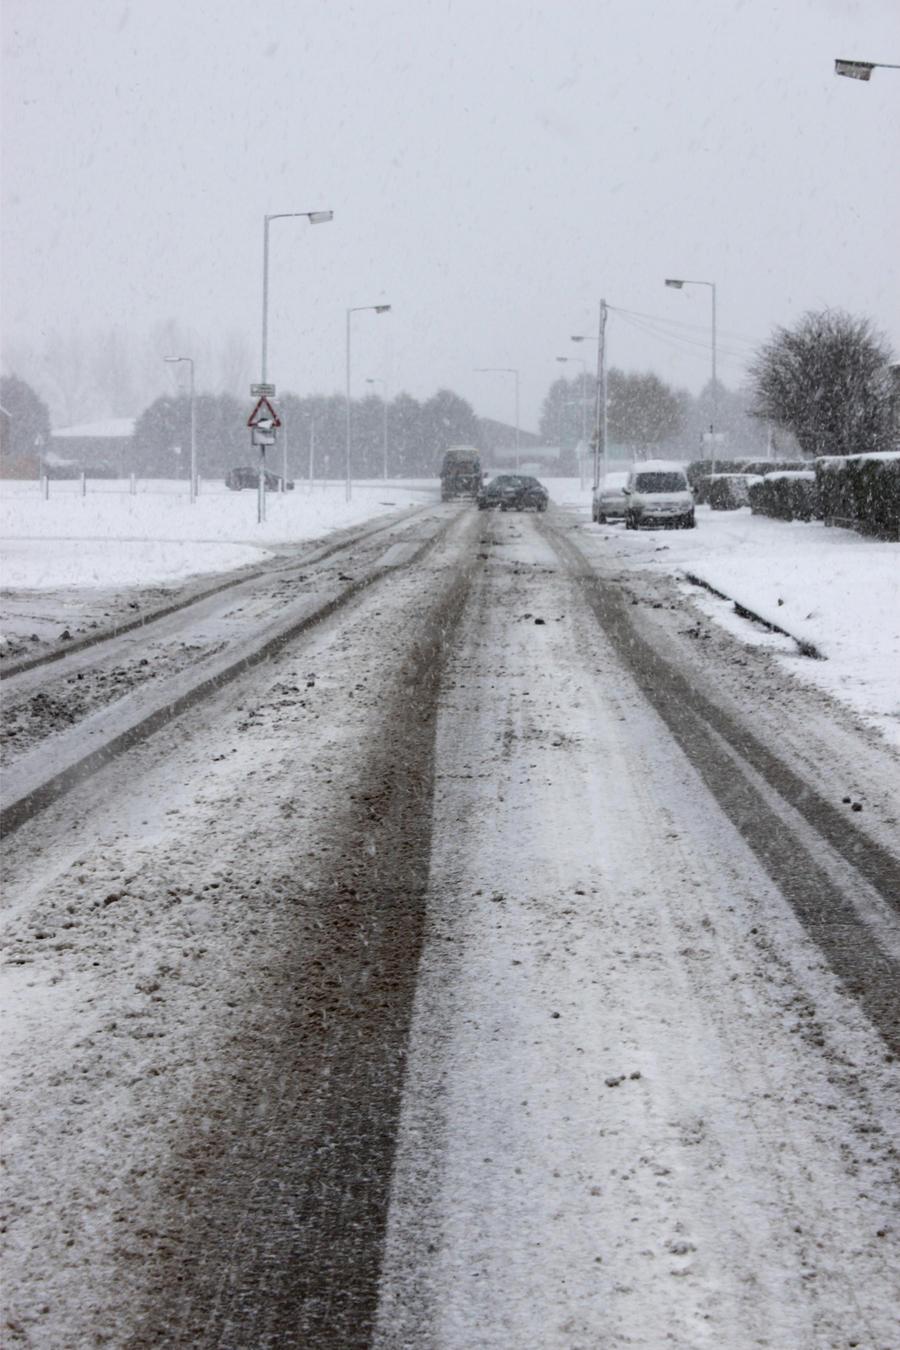 Snowy street 2 by Living-Life-Loud